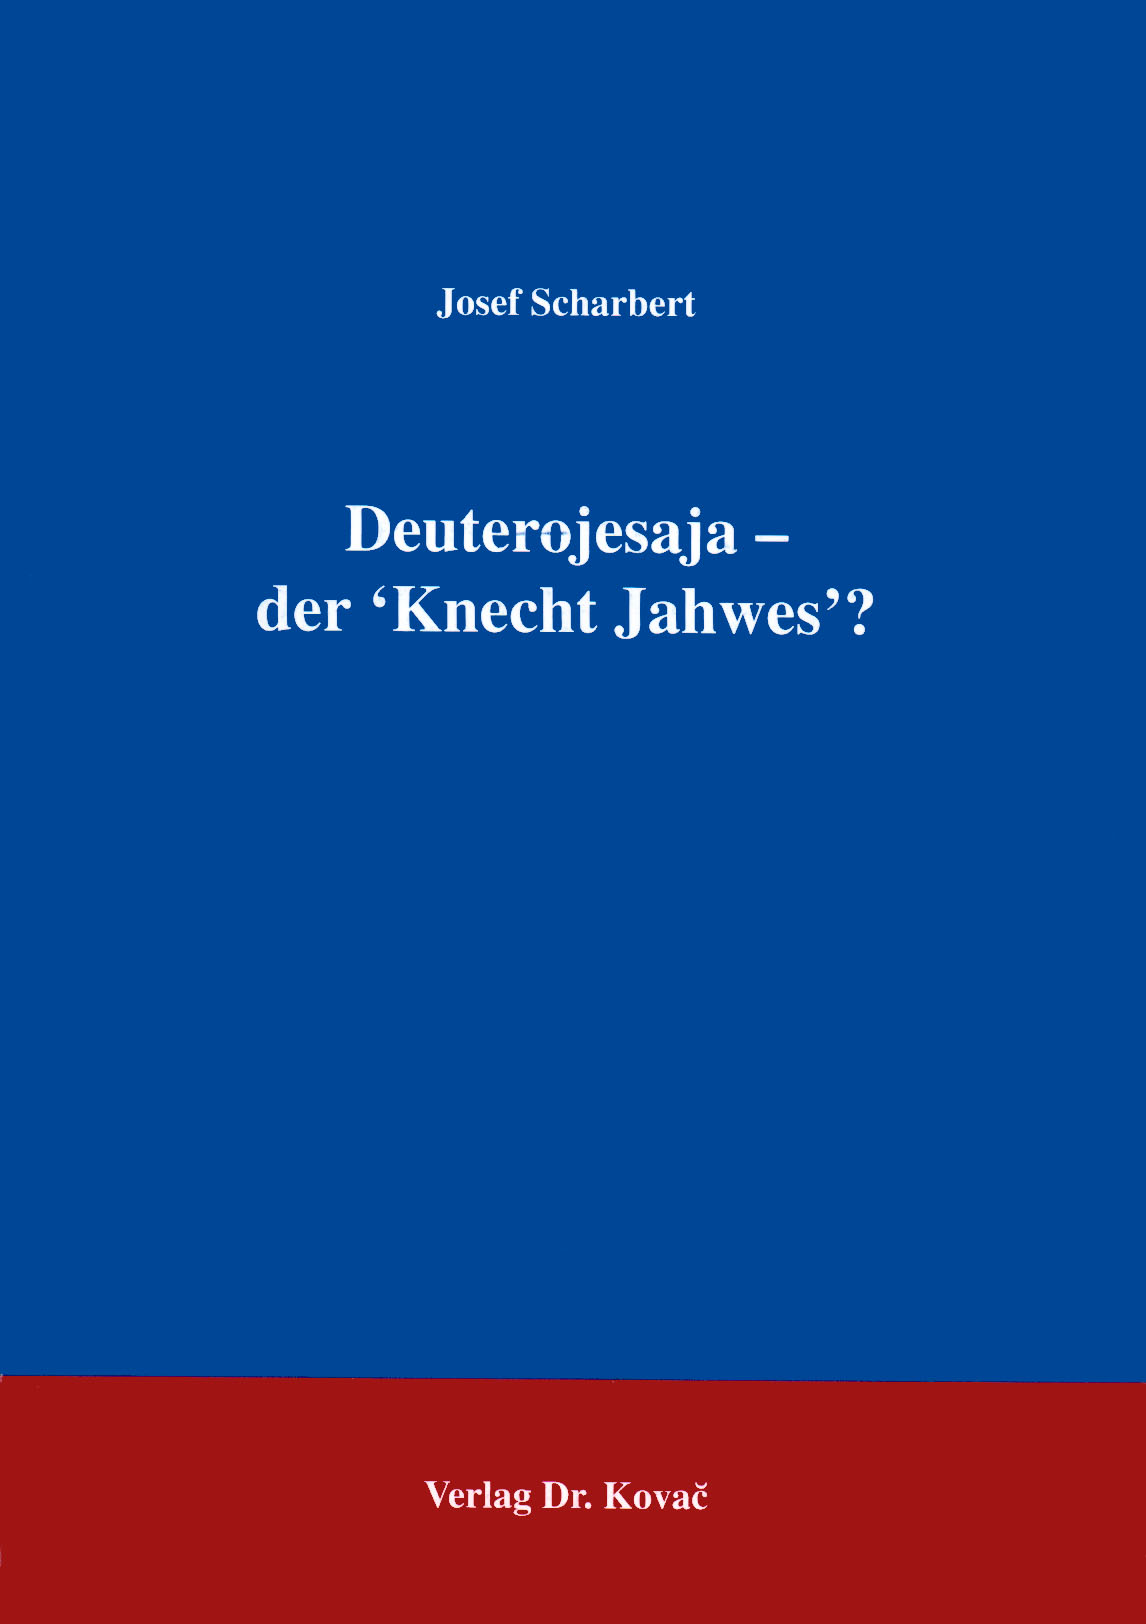 Cover: Deuterojesaja – der 'Knecht Jahwes'?